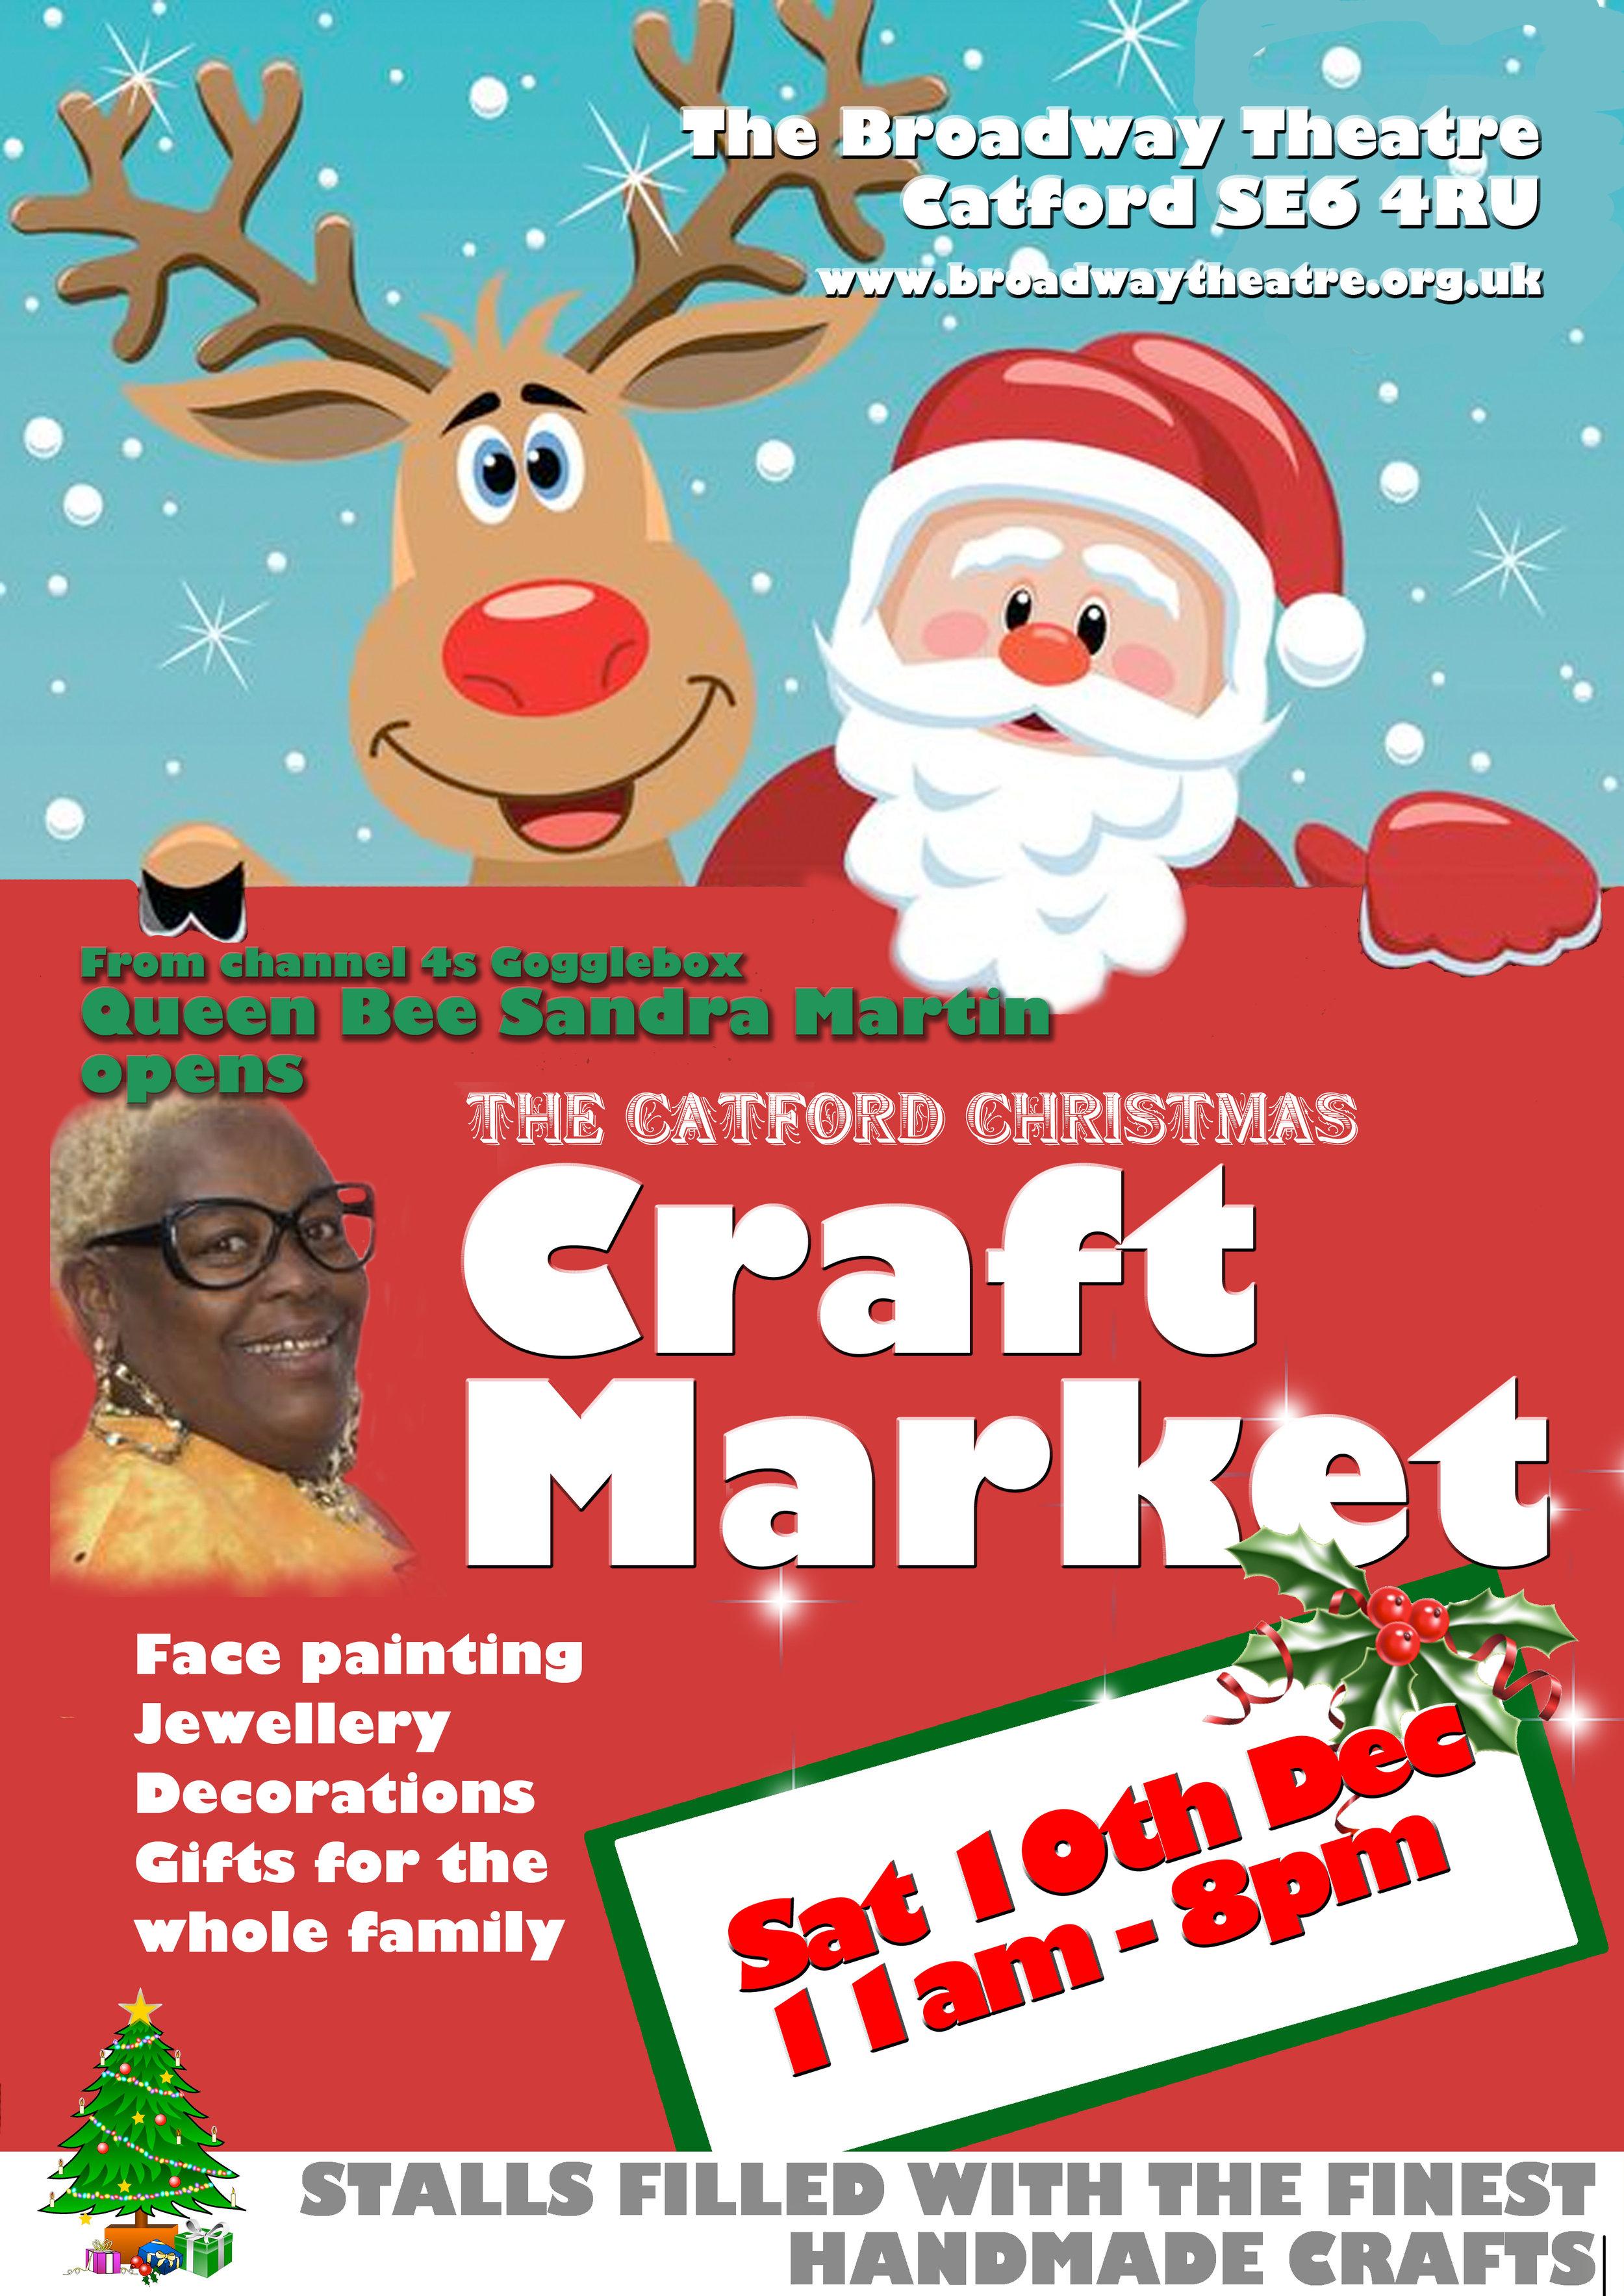 Catford Christmas Market 2016